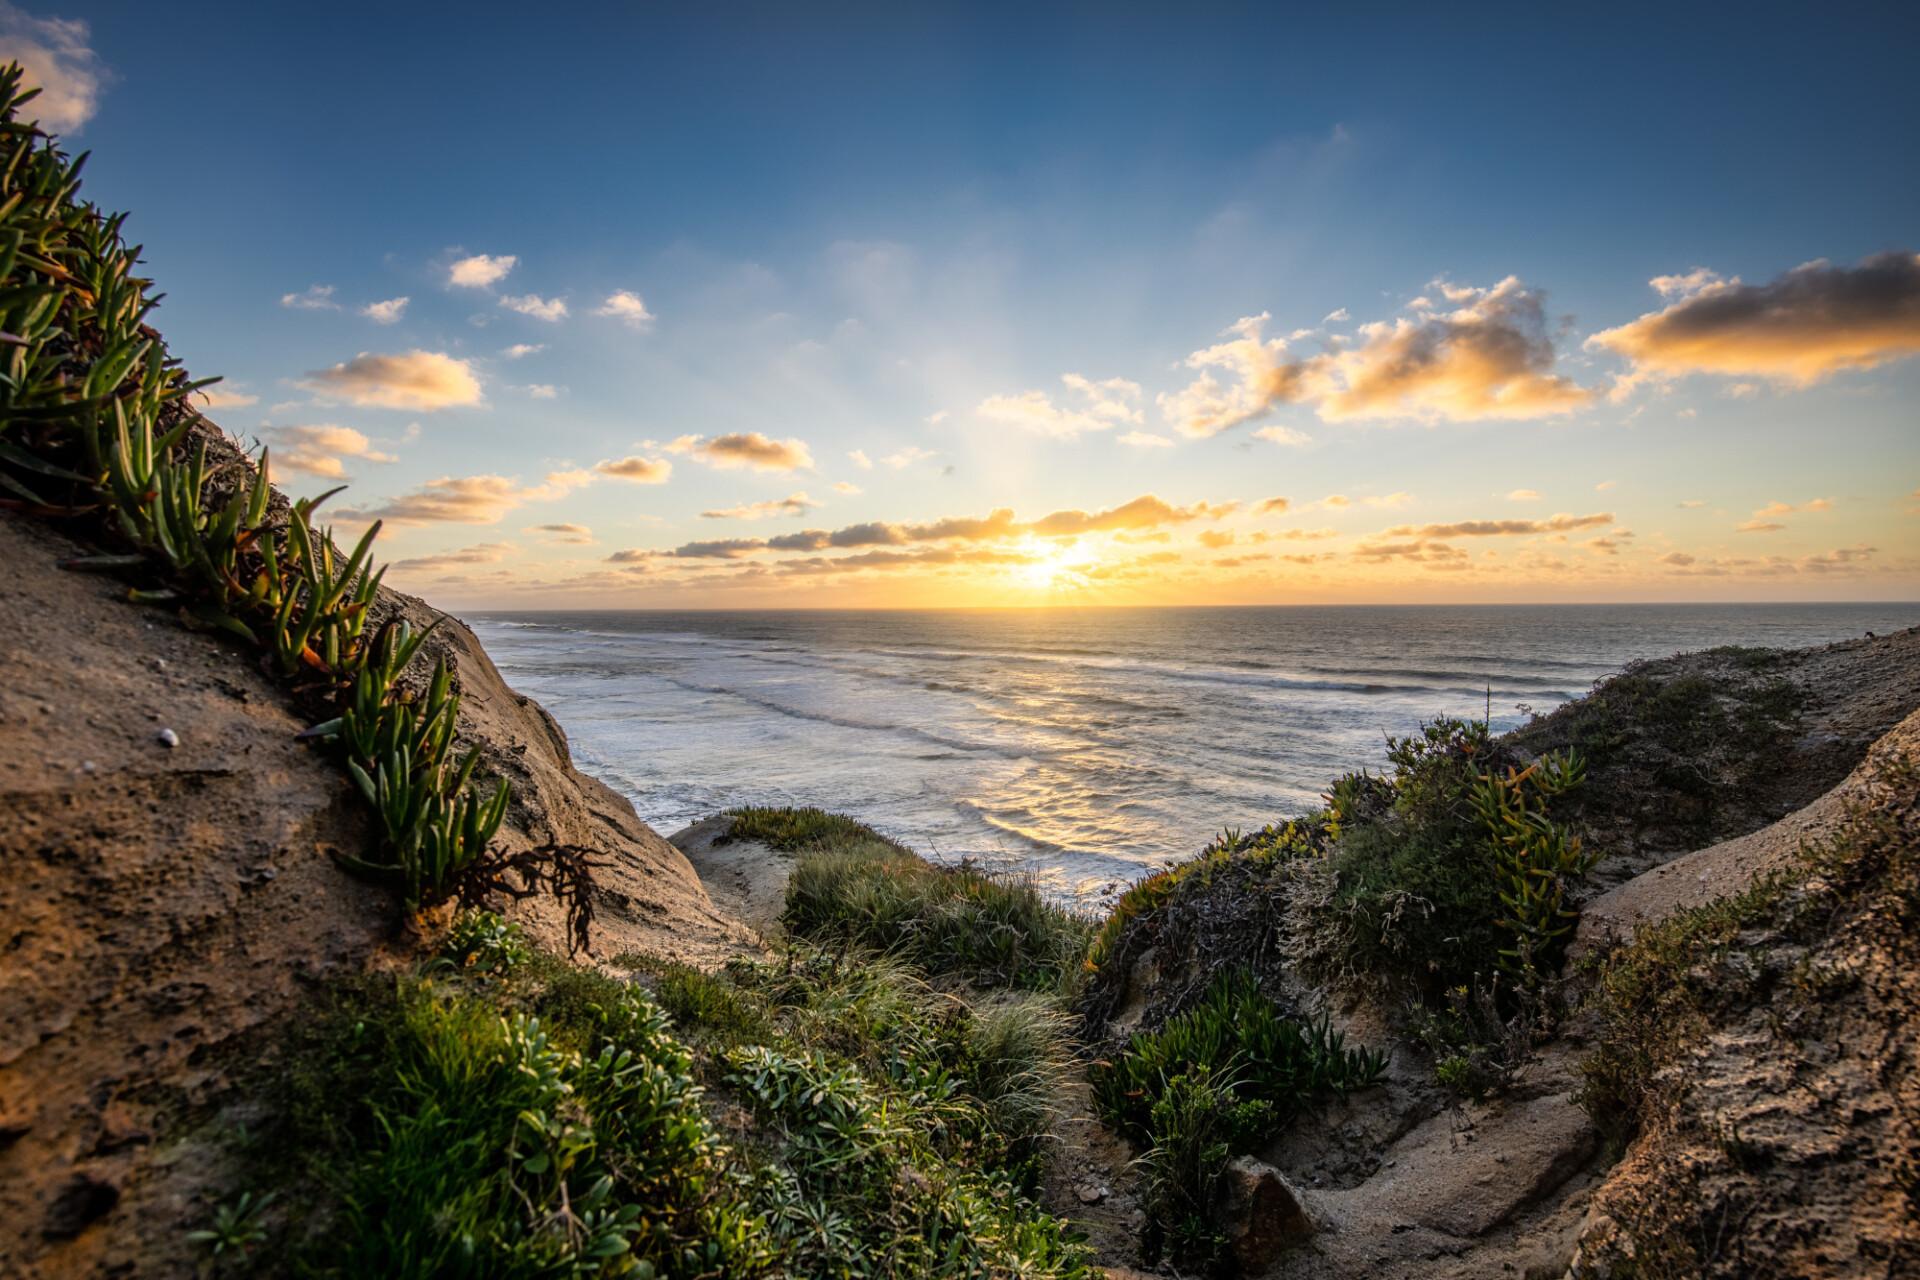 Praia do Seixo Sunset - Seascape Panorama